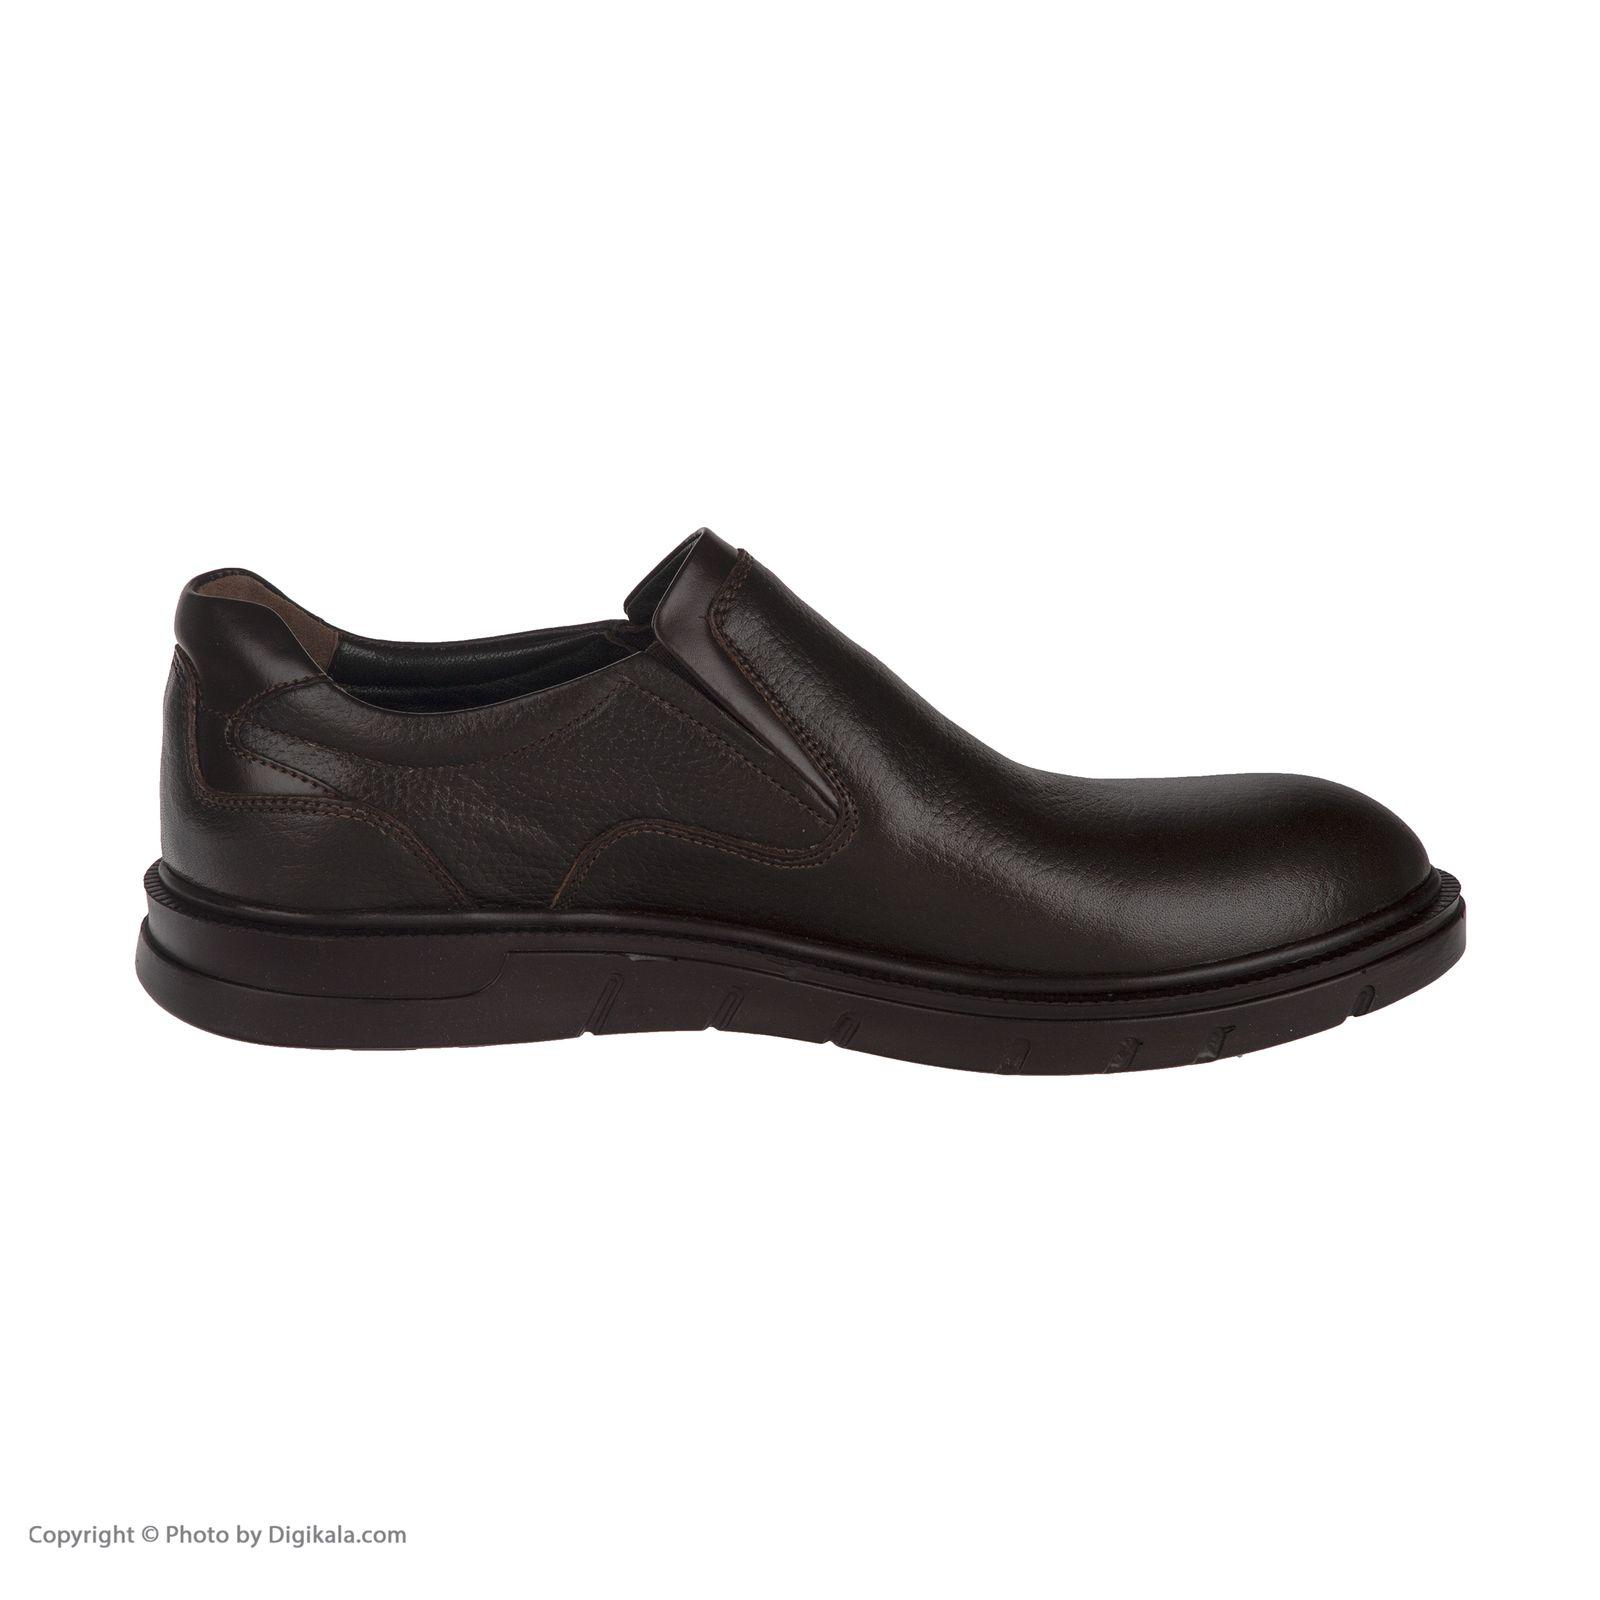 کفش روزمره مردانه بلوط مدل 7240C503104 -  - 7